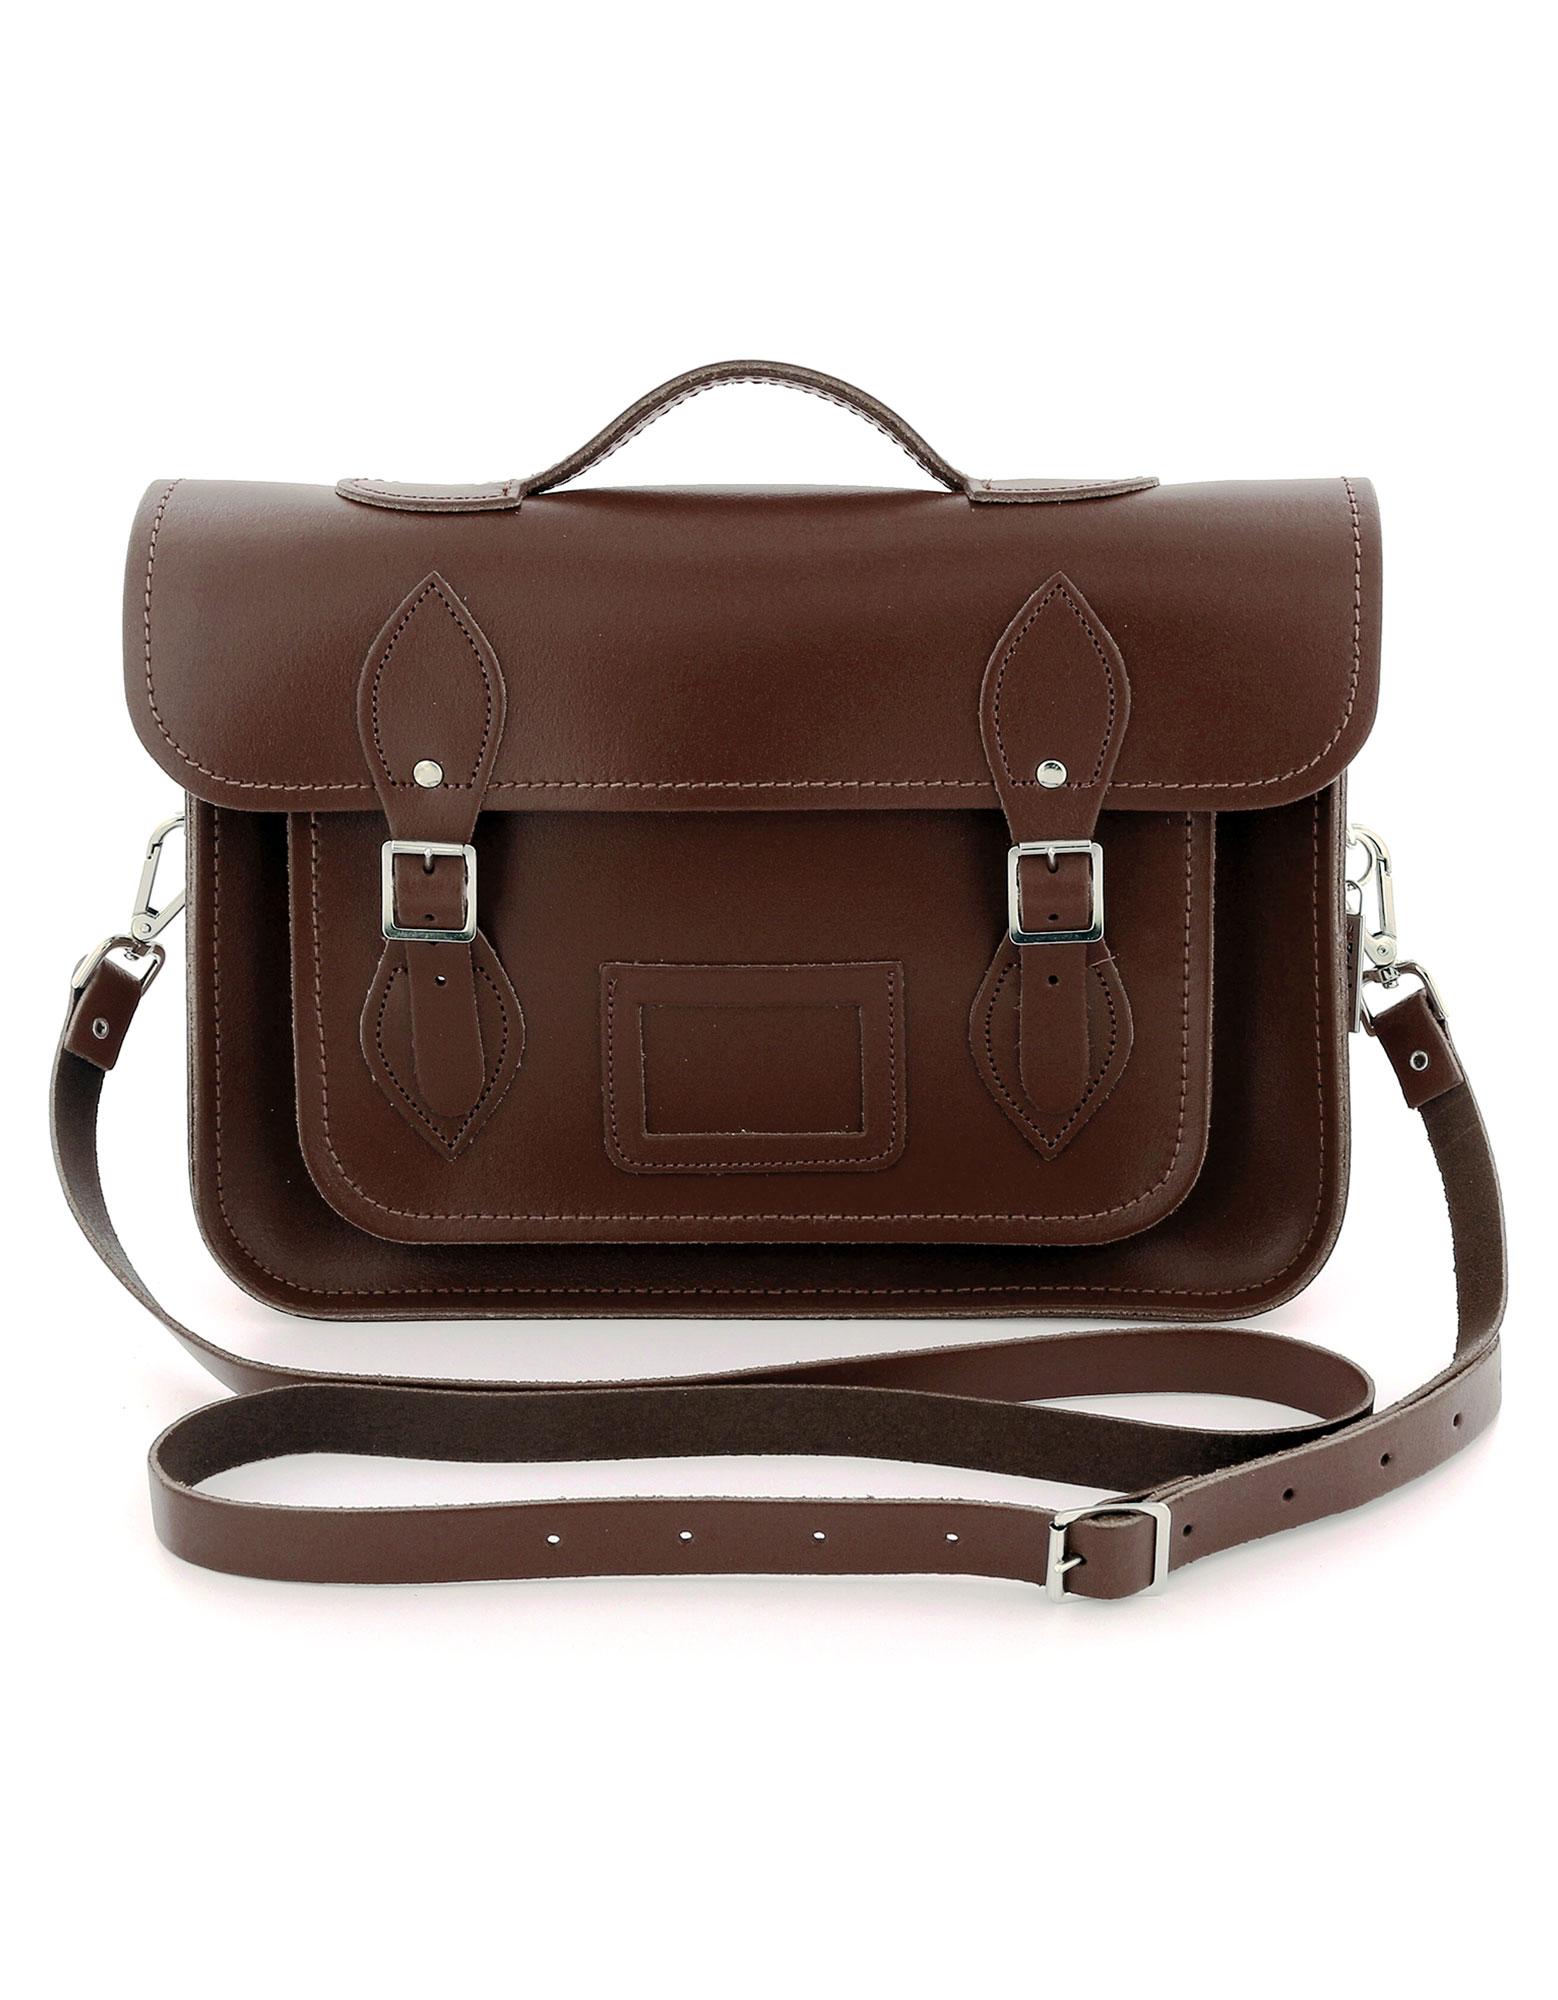 Zatchel Classic Chestnut/Leather Satchel 13 Inch